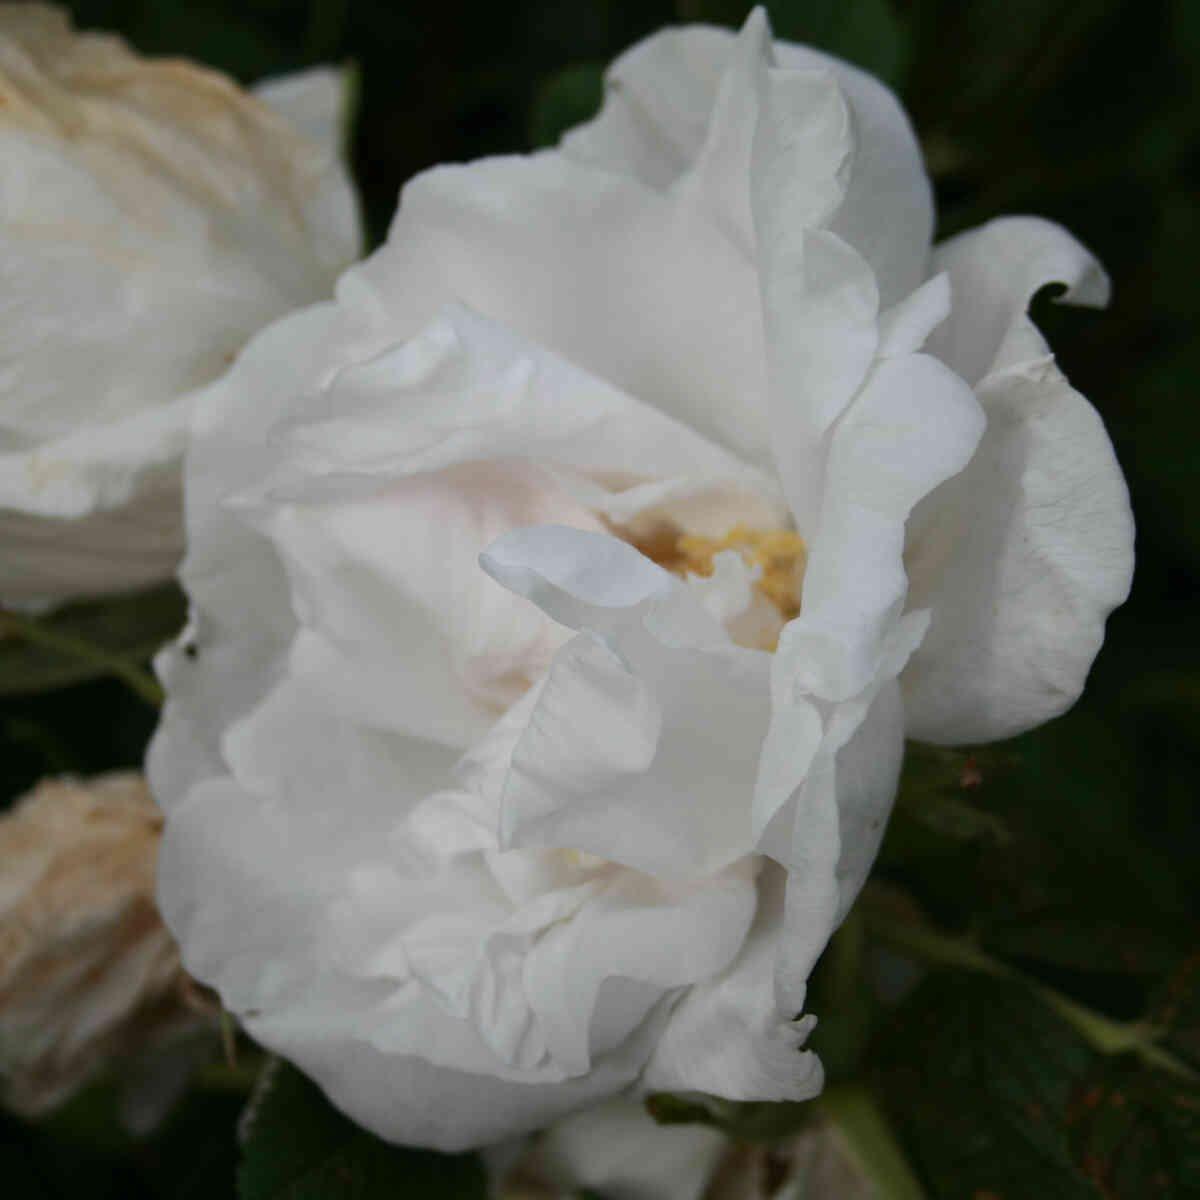 Hybenrose rugosa 'Schnee Eule'